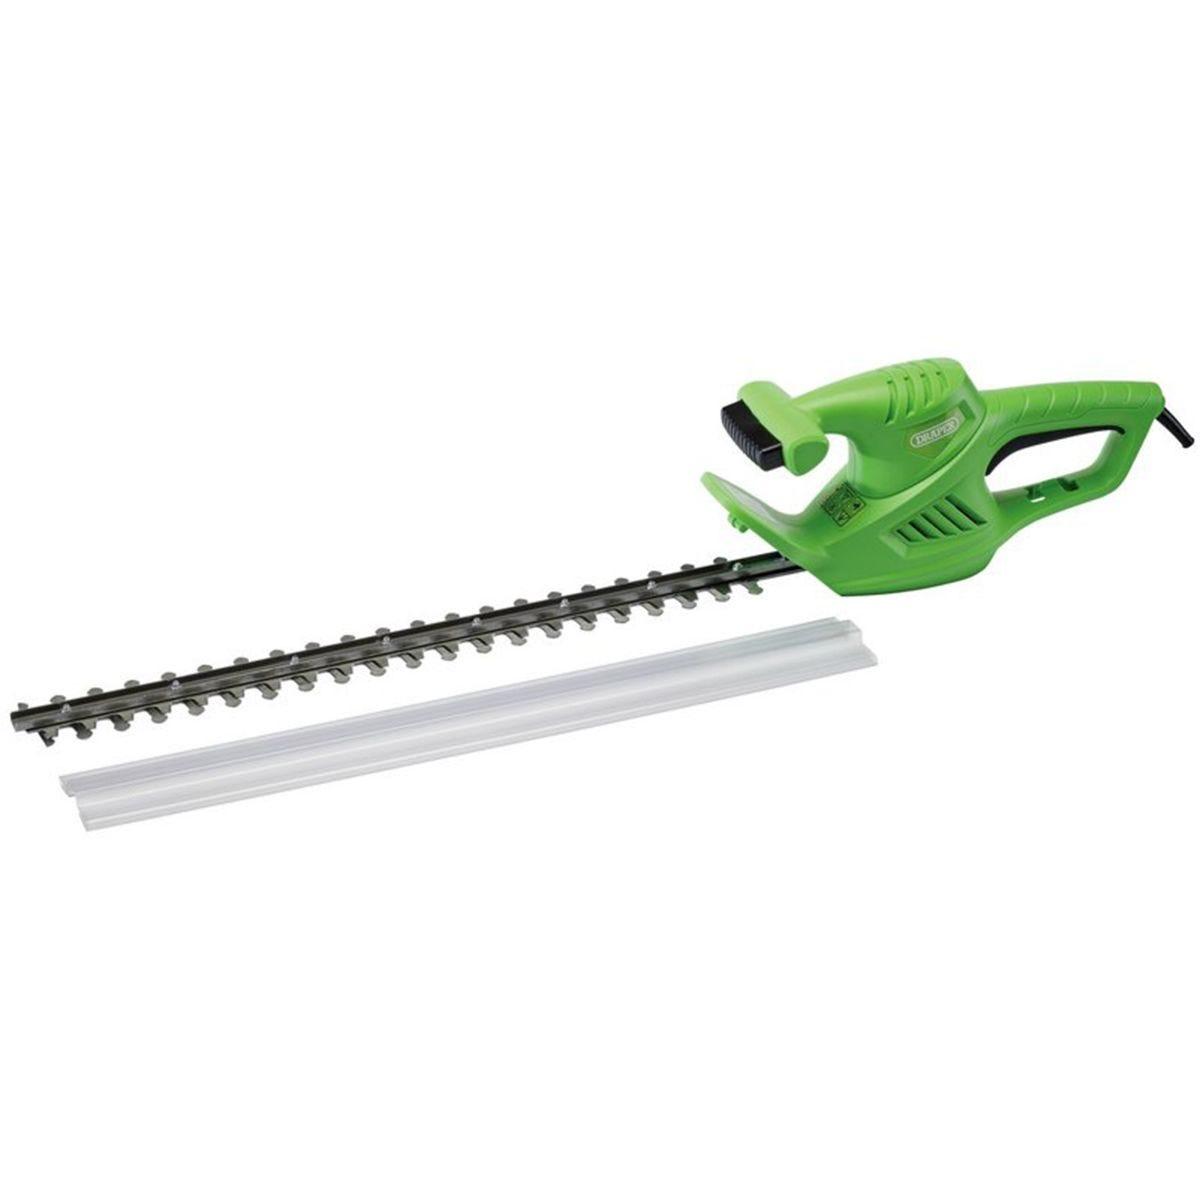 Draper 550mm Hedge Trimmer (600W)